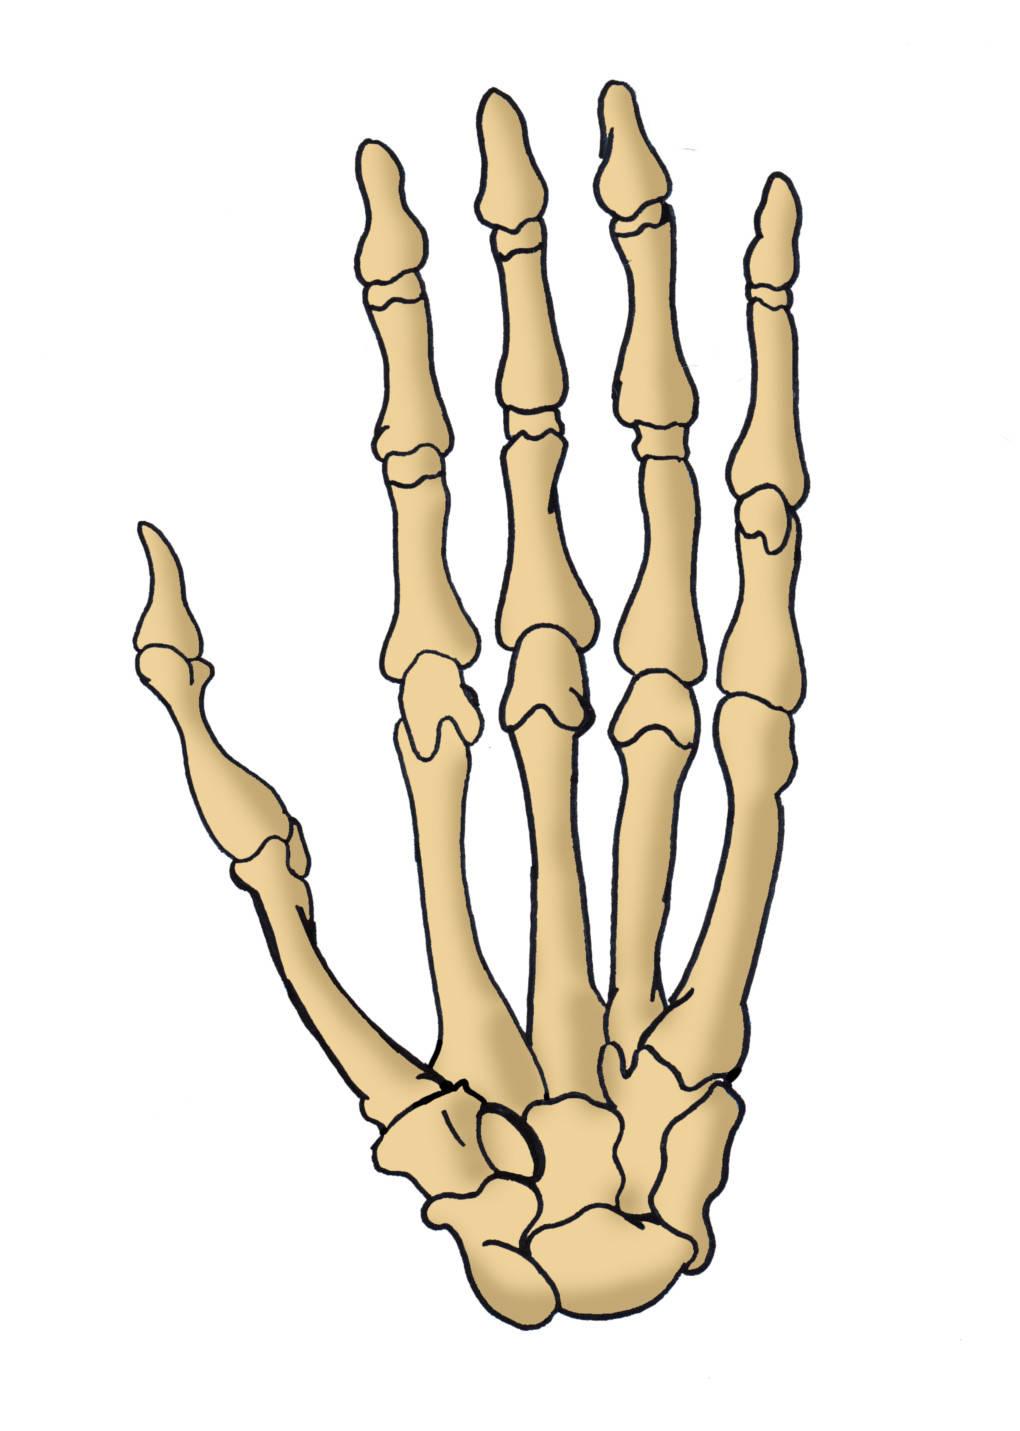 Knochenhand.jpg